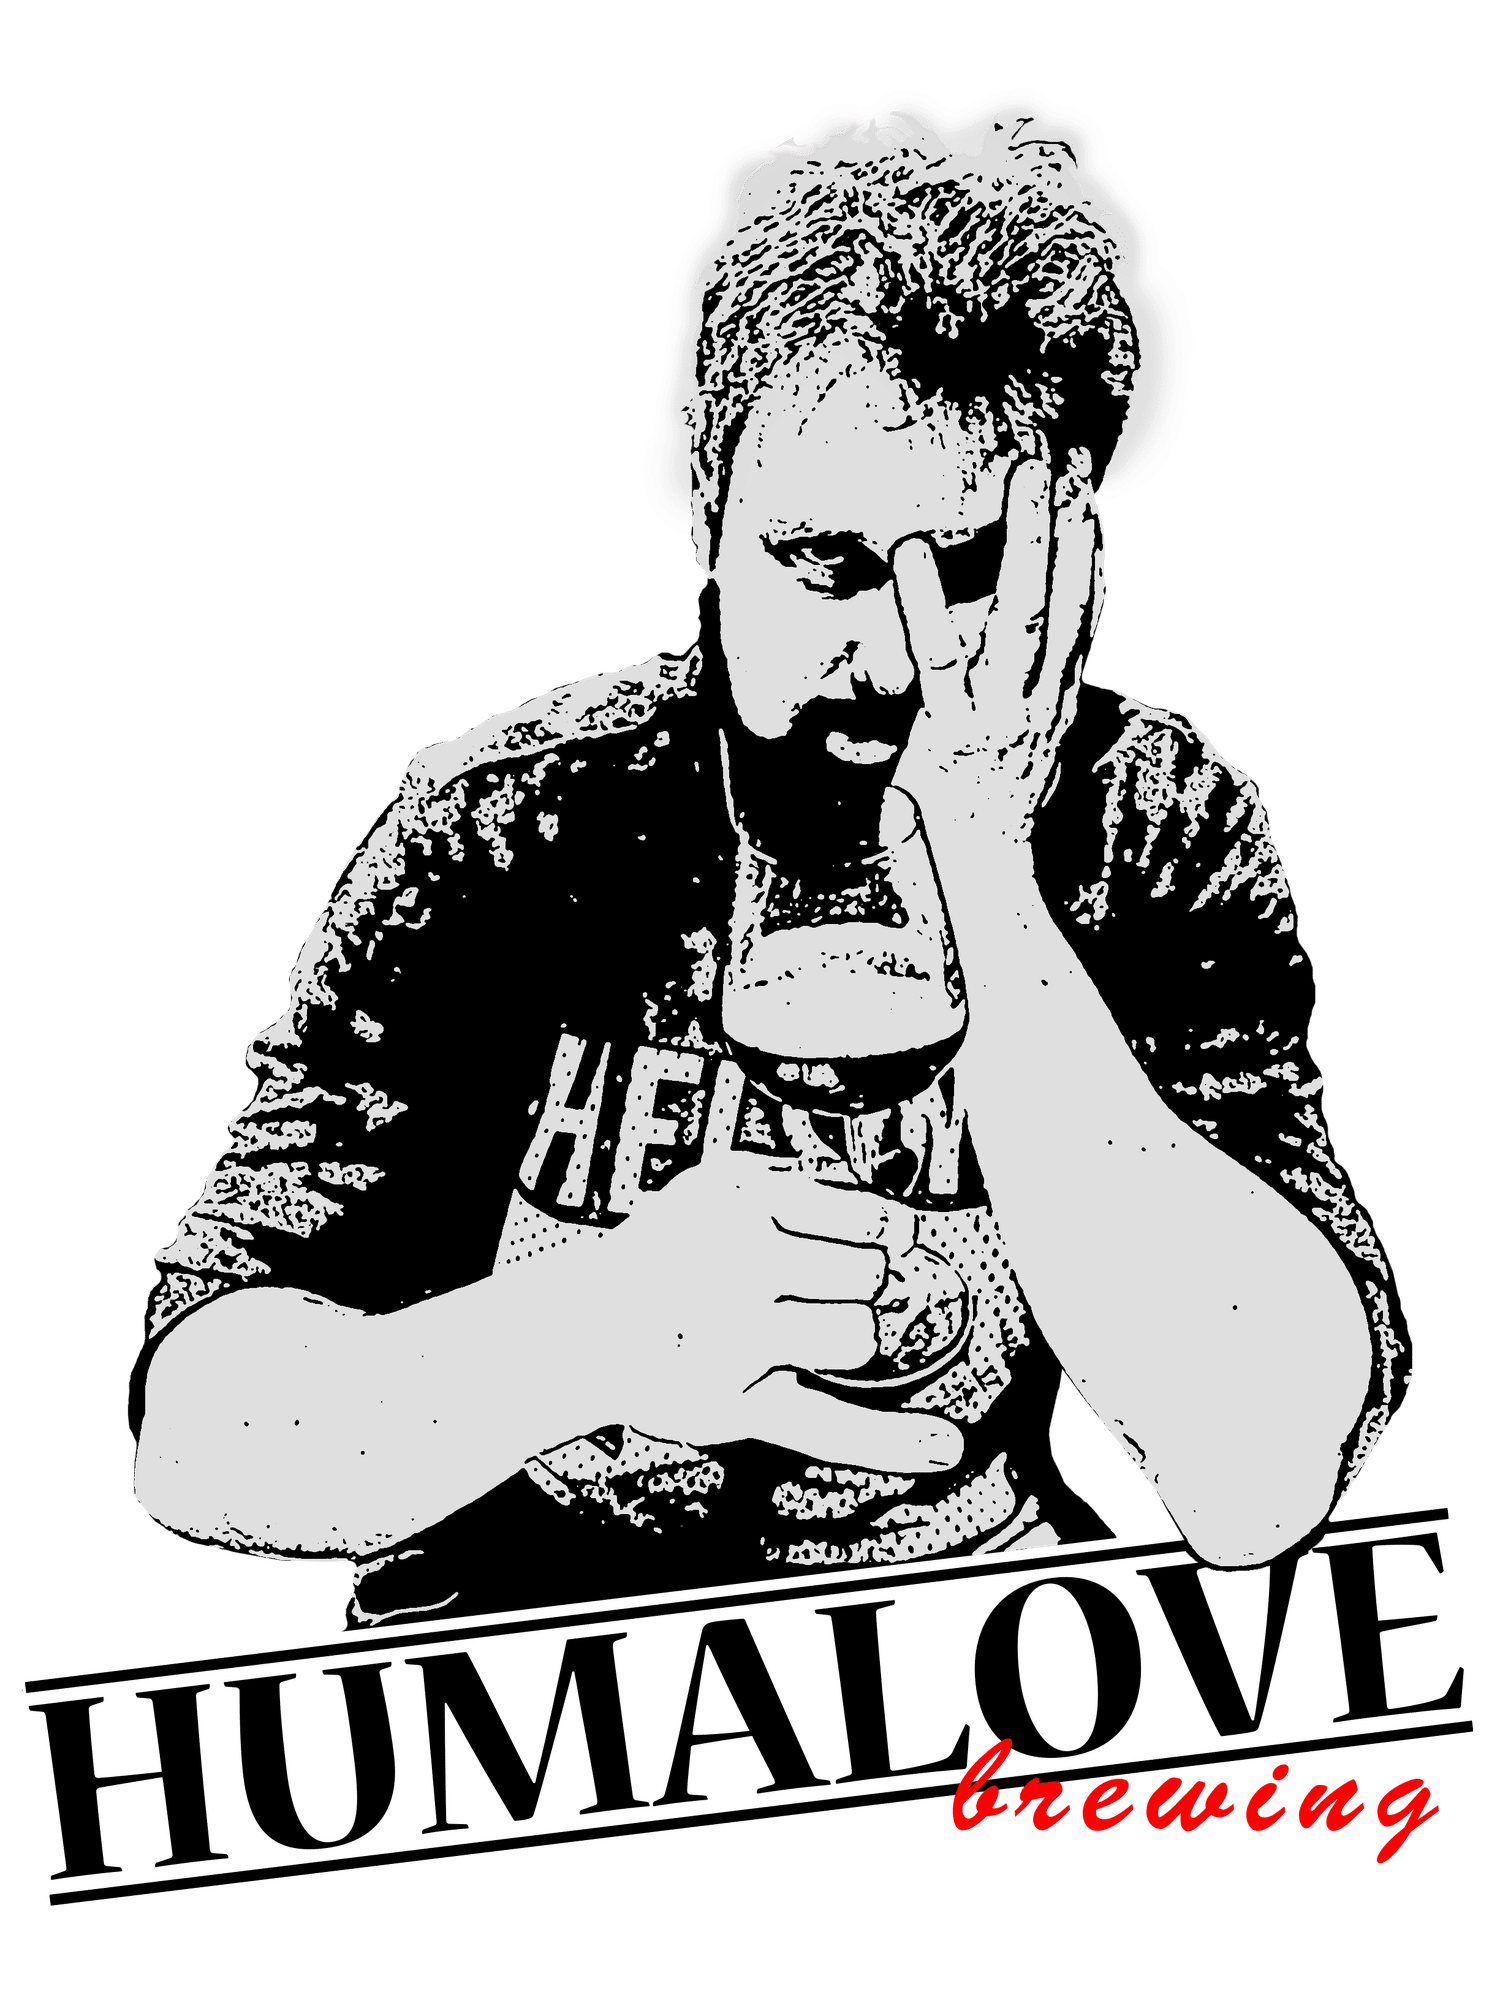 Humalove